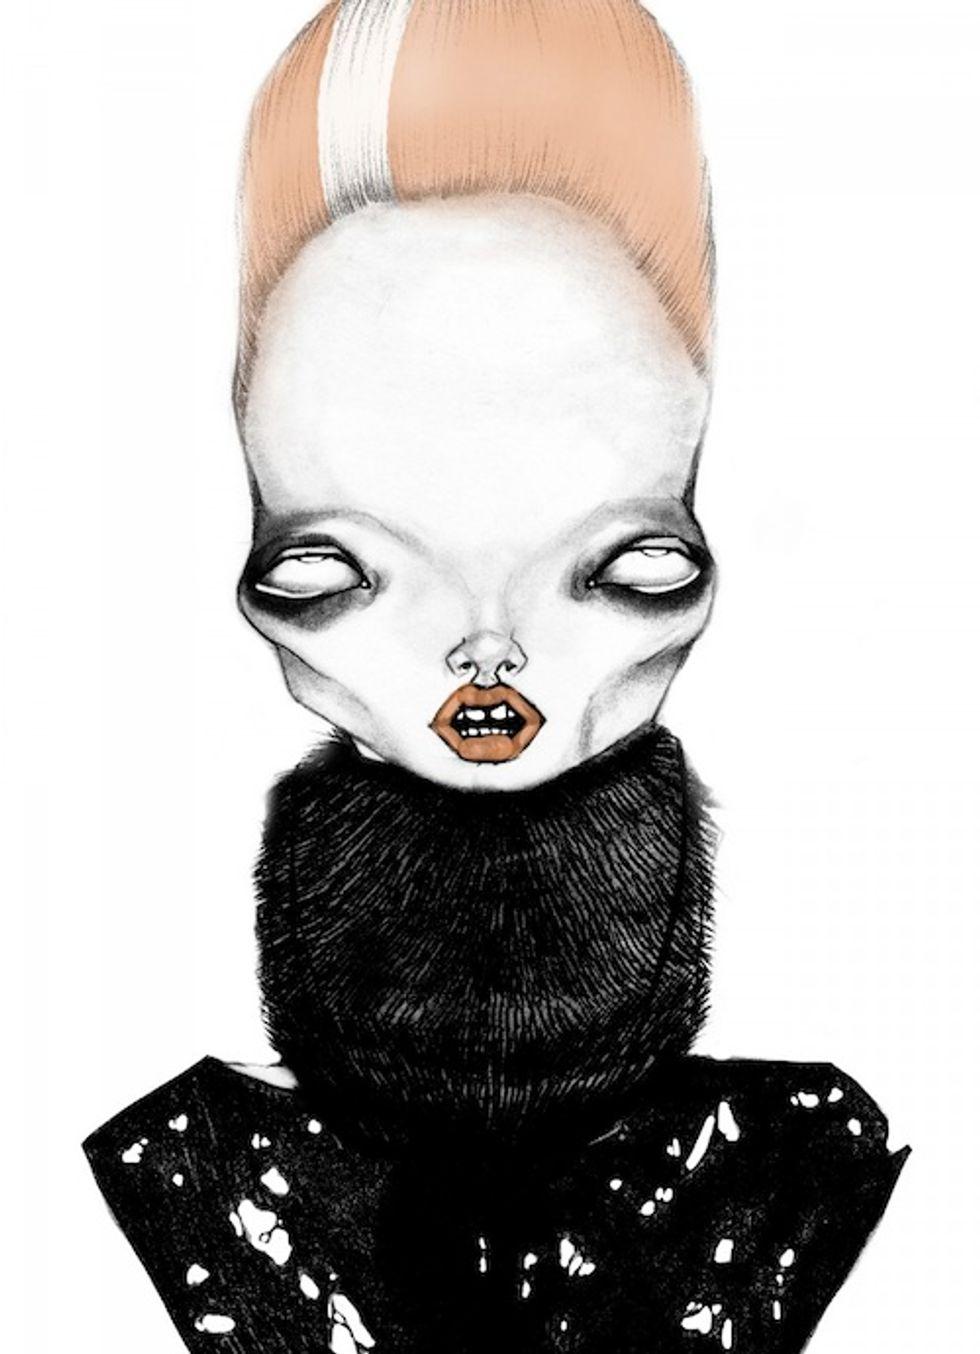 Five Unconventional Illustrators Exploring The Darker Side of Fashion